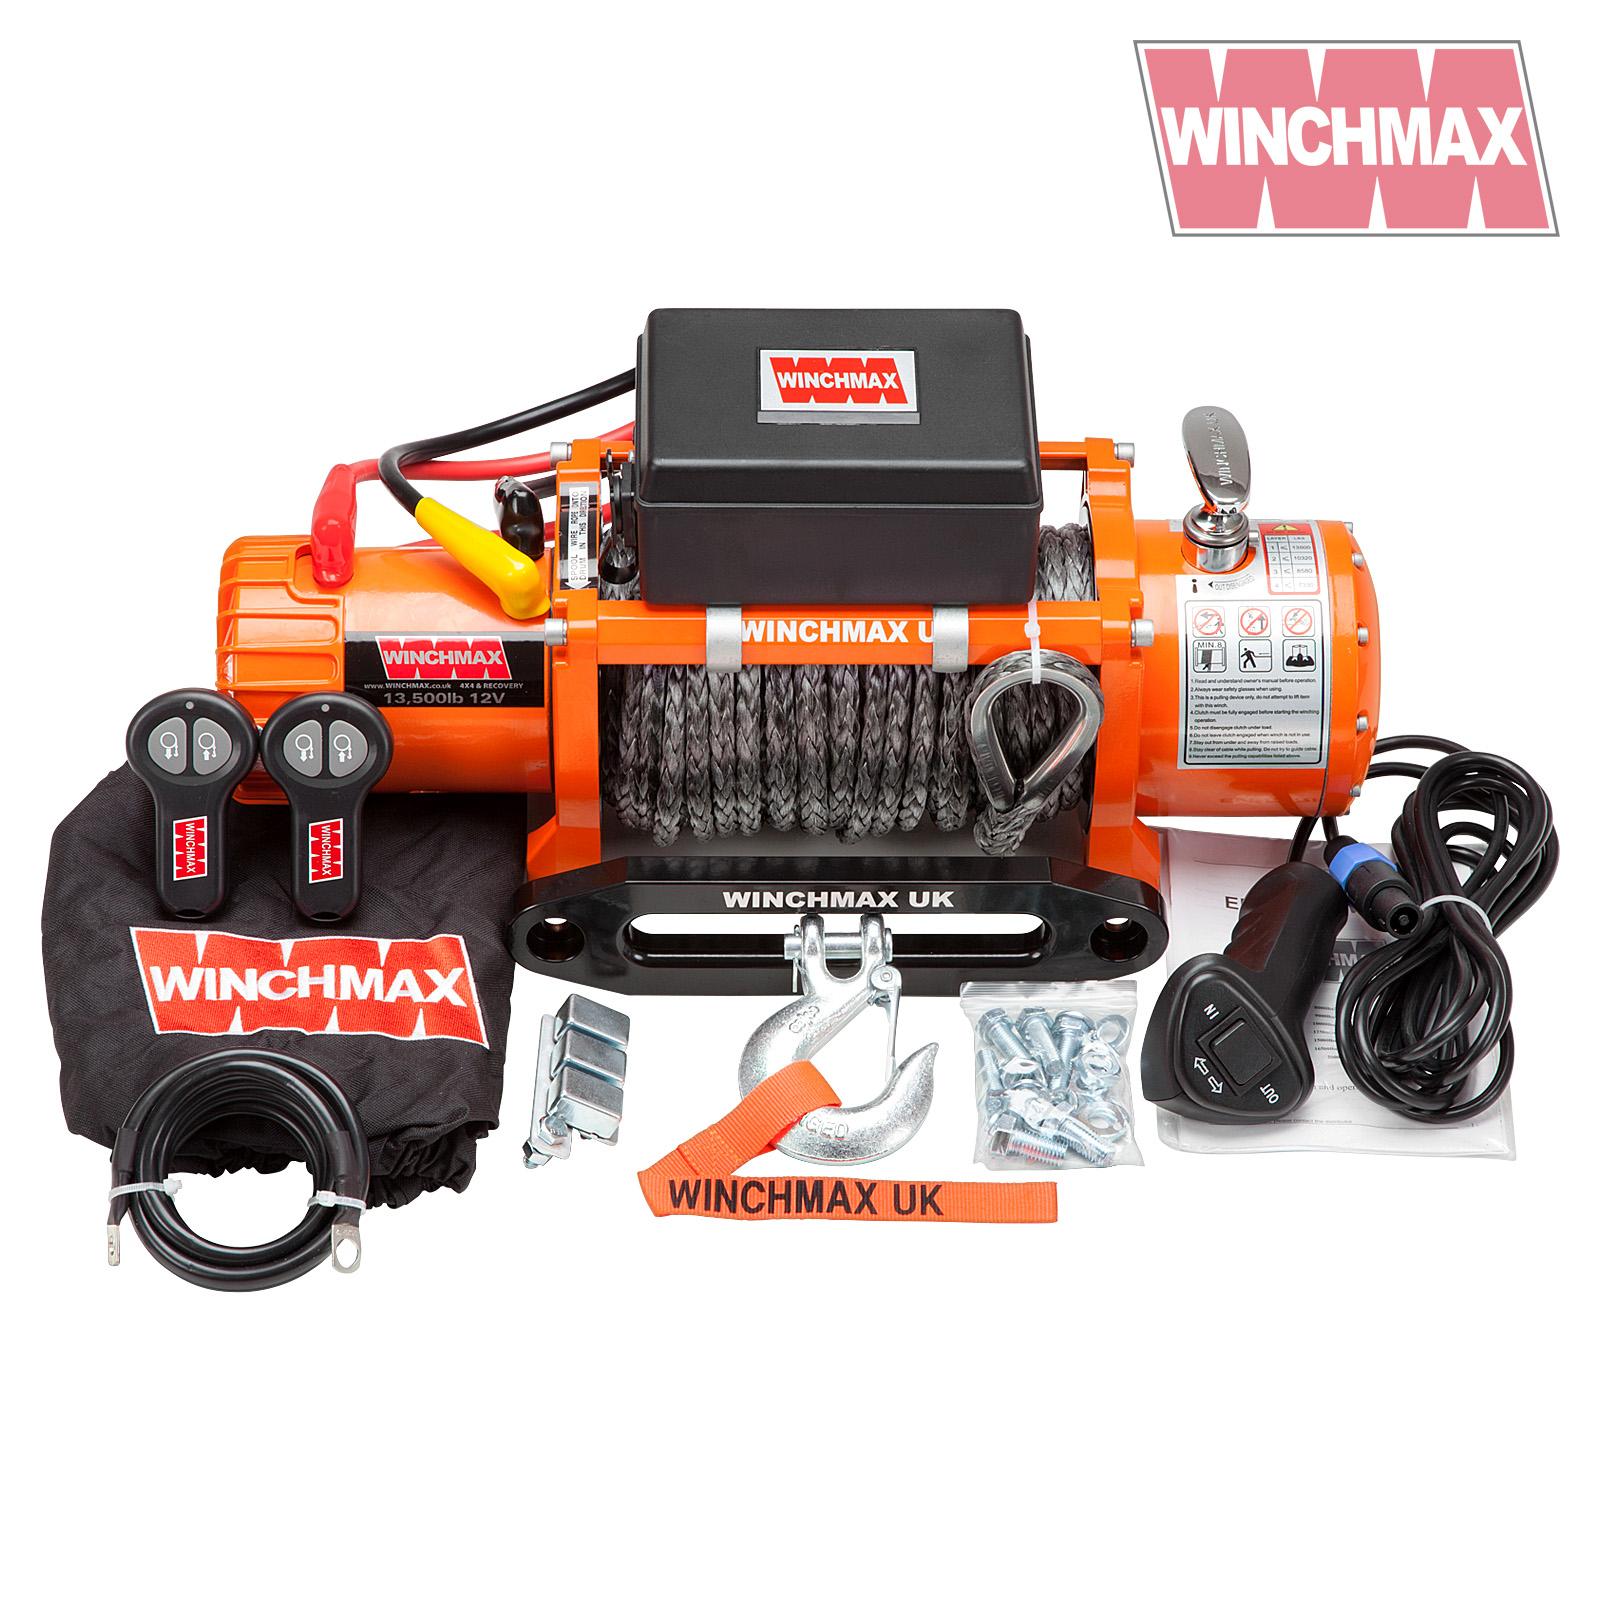 Wm1350012vsyn winchmax 491